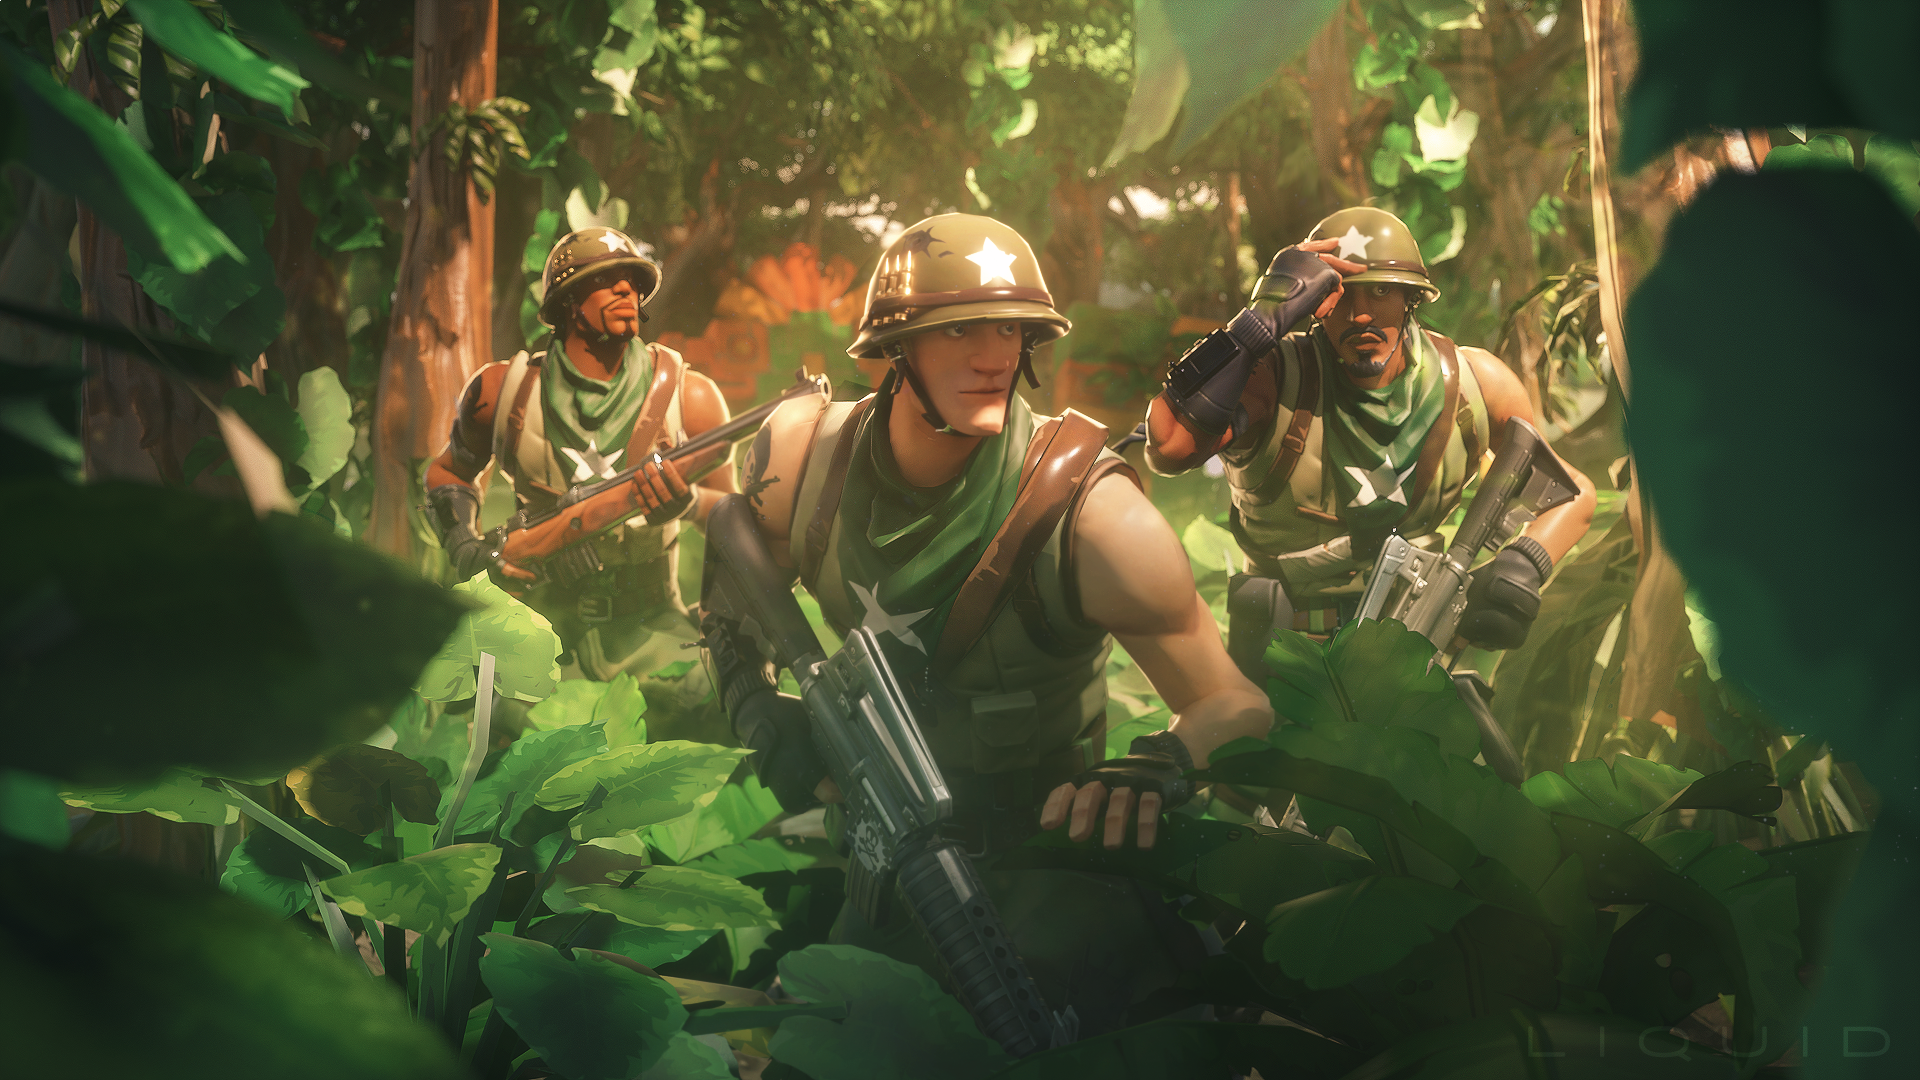 Wallpapers fortnite video games